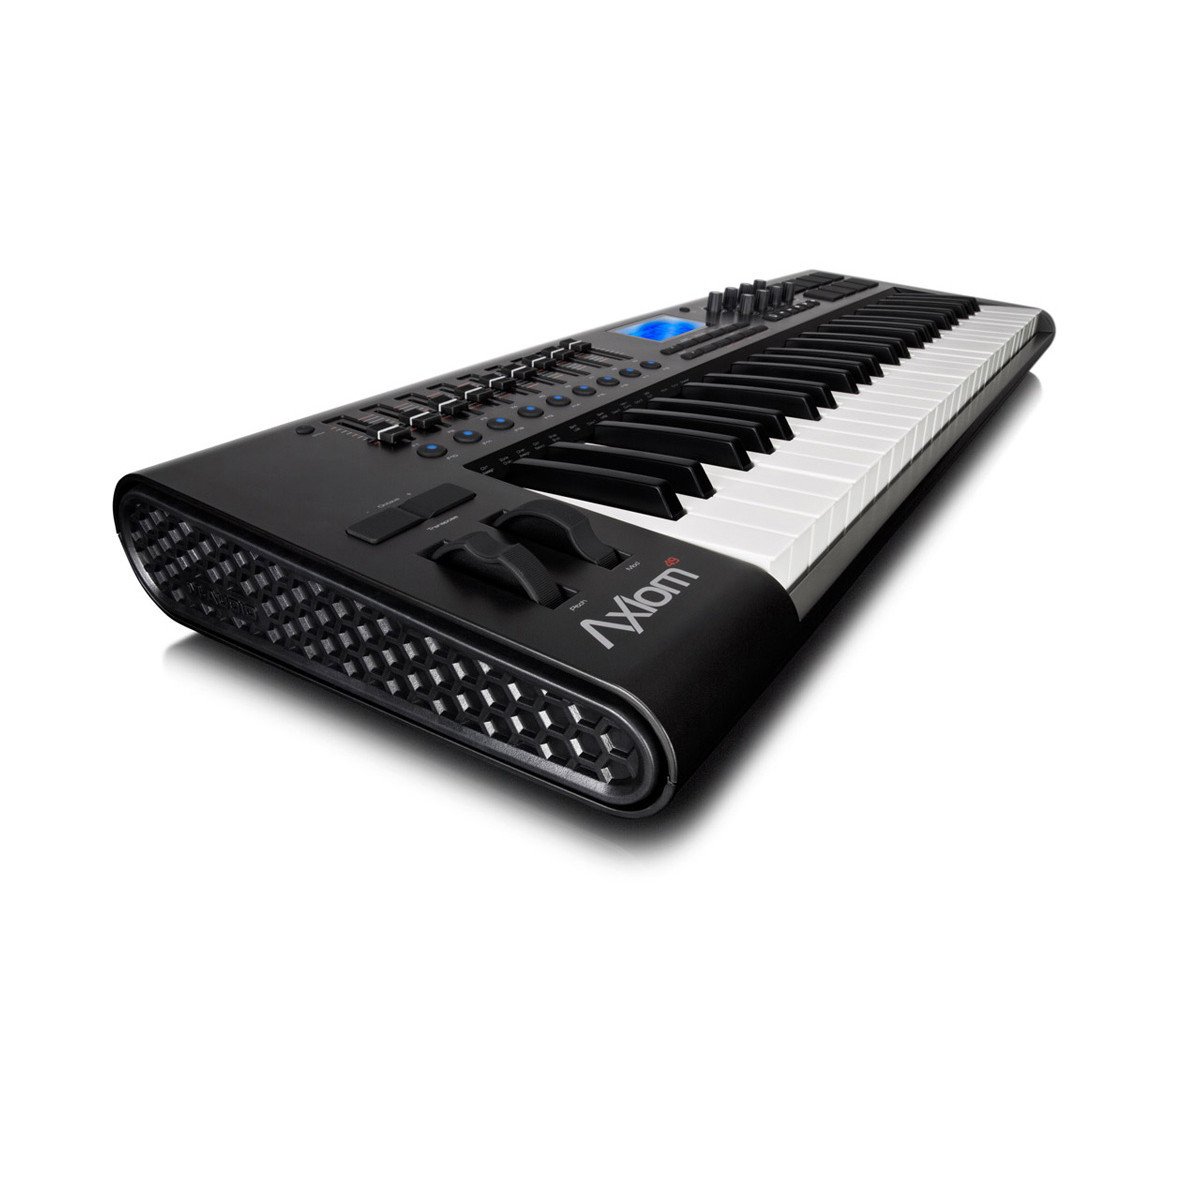 m audio axiom 61 mkii advanced usb midi controller keyboard ex demo at gear4music. Black Bedroom Furniture Sets. Home Design Ideas